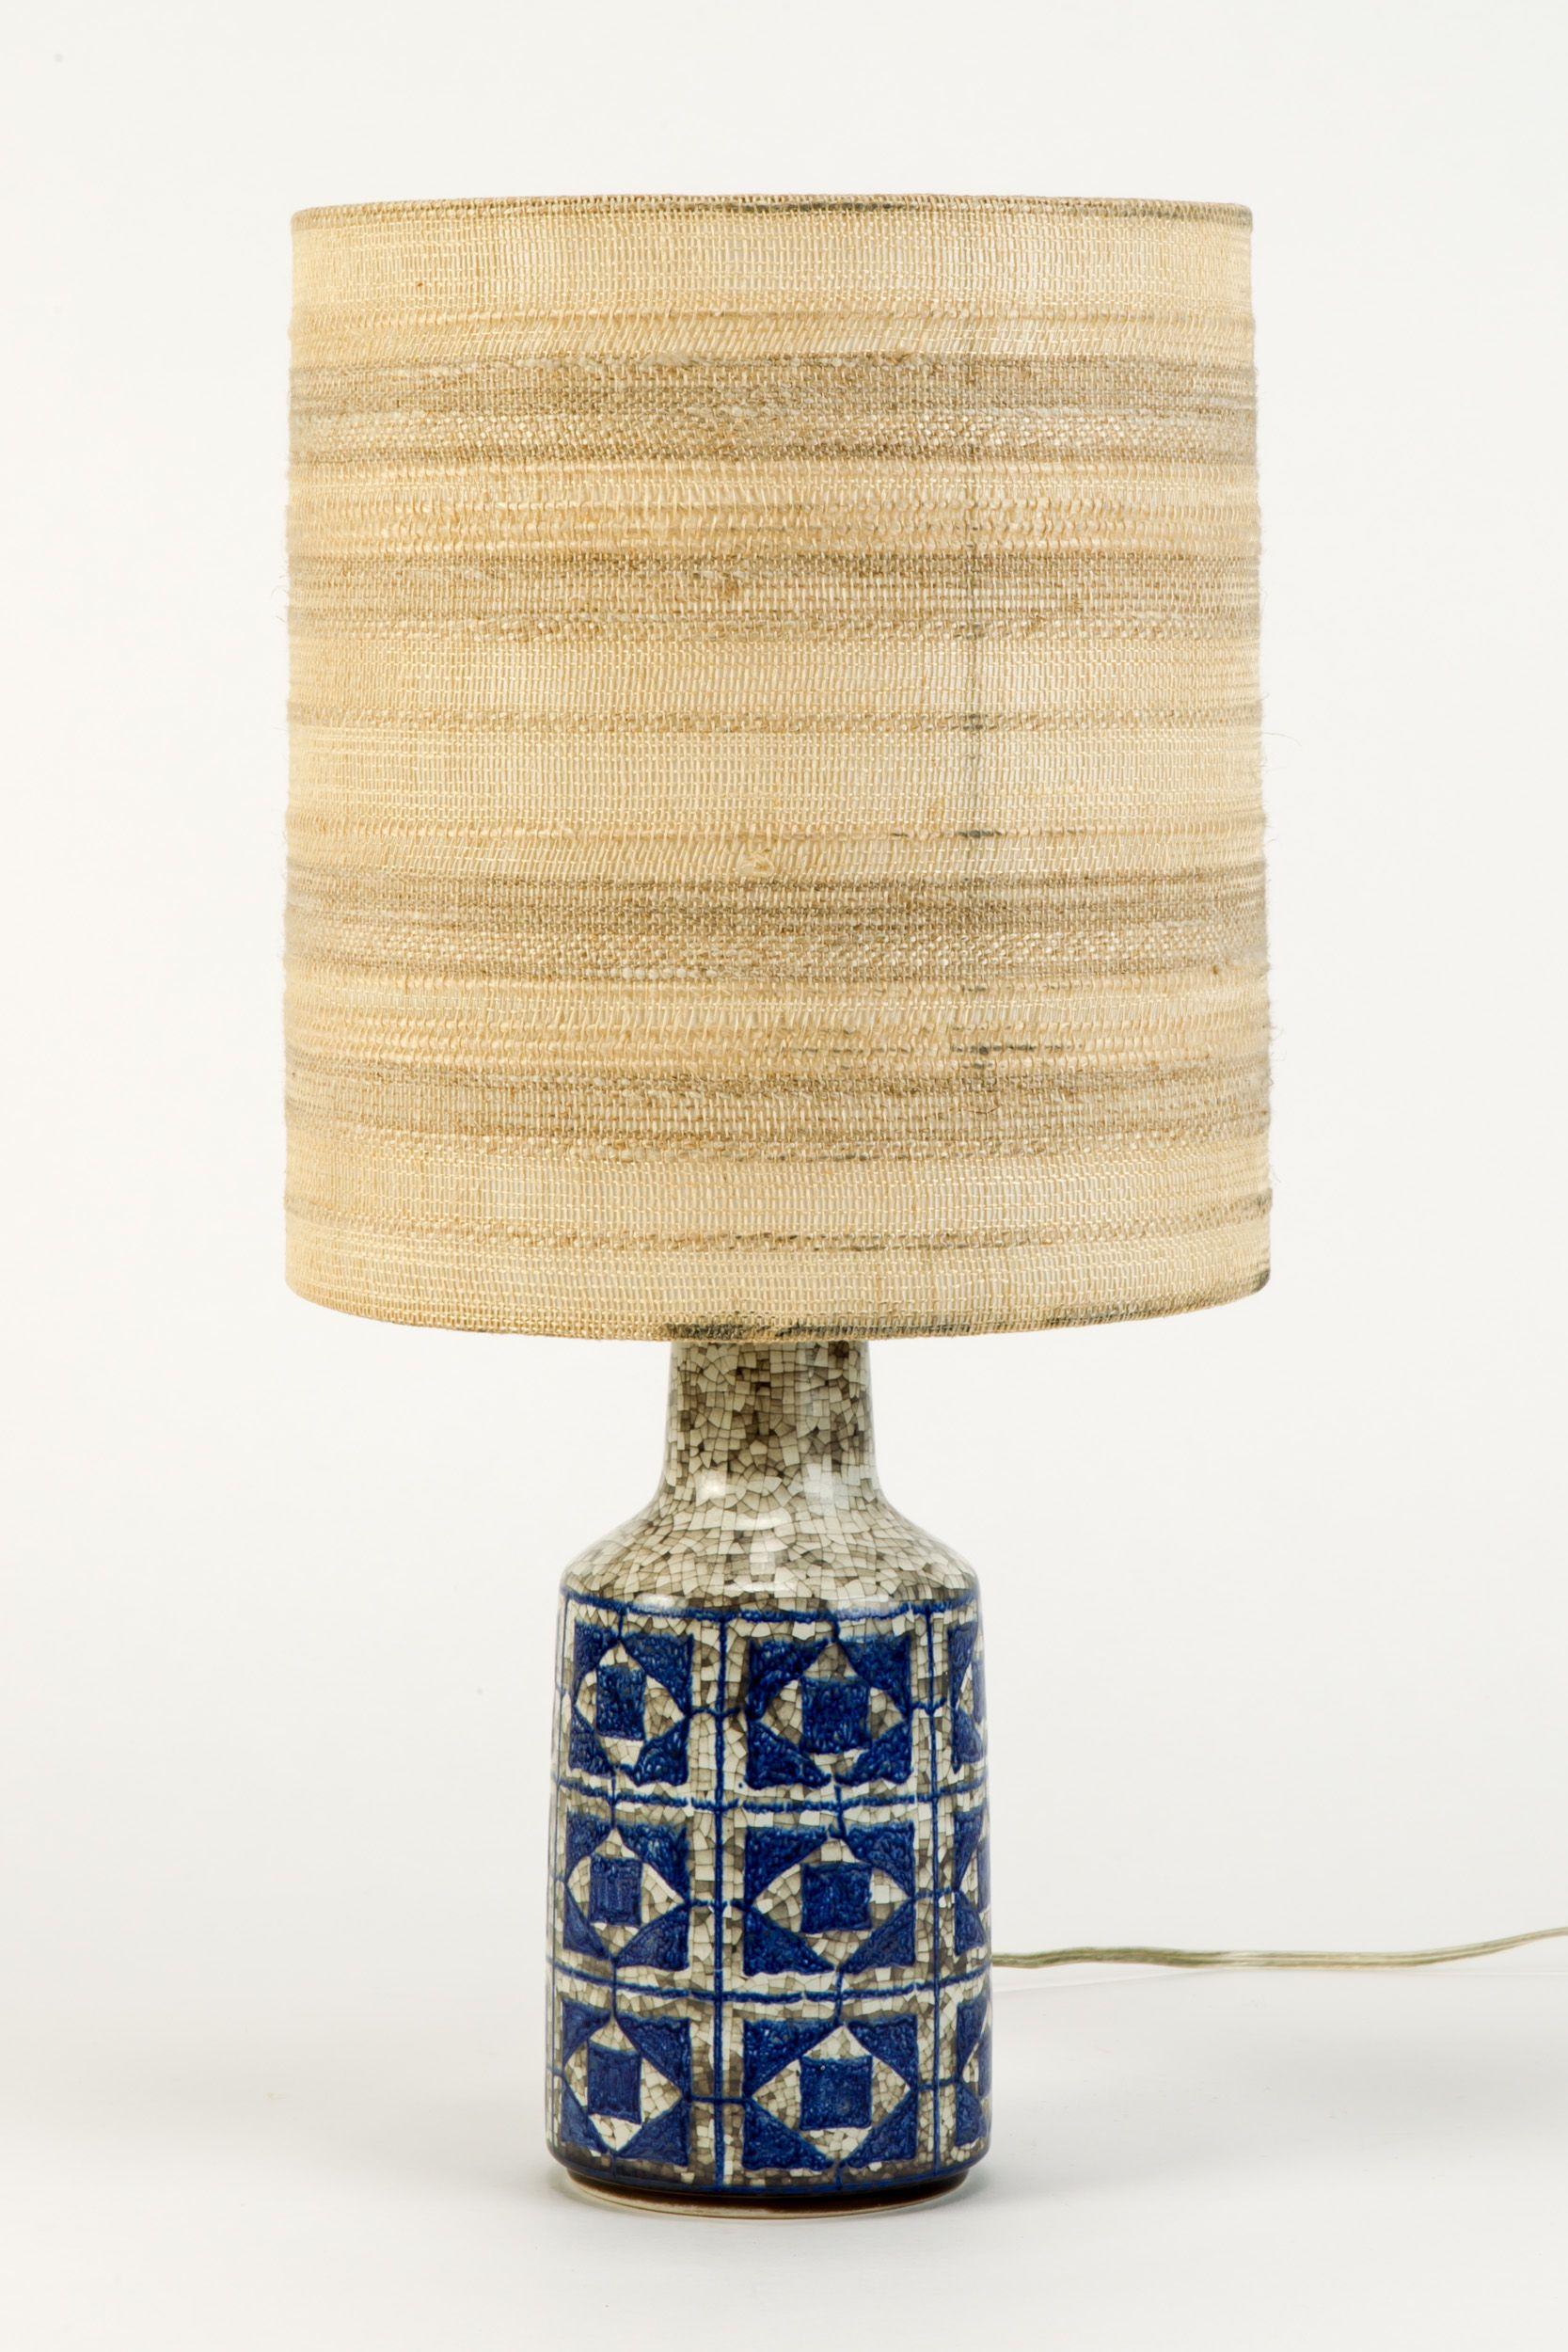 phantasievolle inspiration keramik tischlampe große images der eceabbcbebaffe